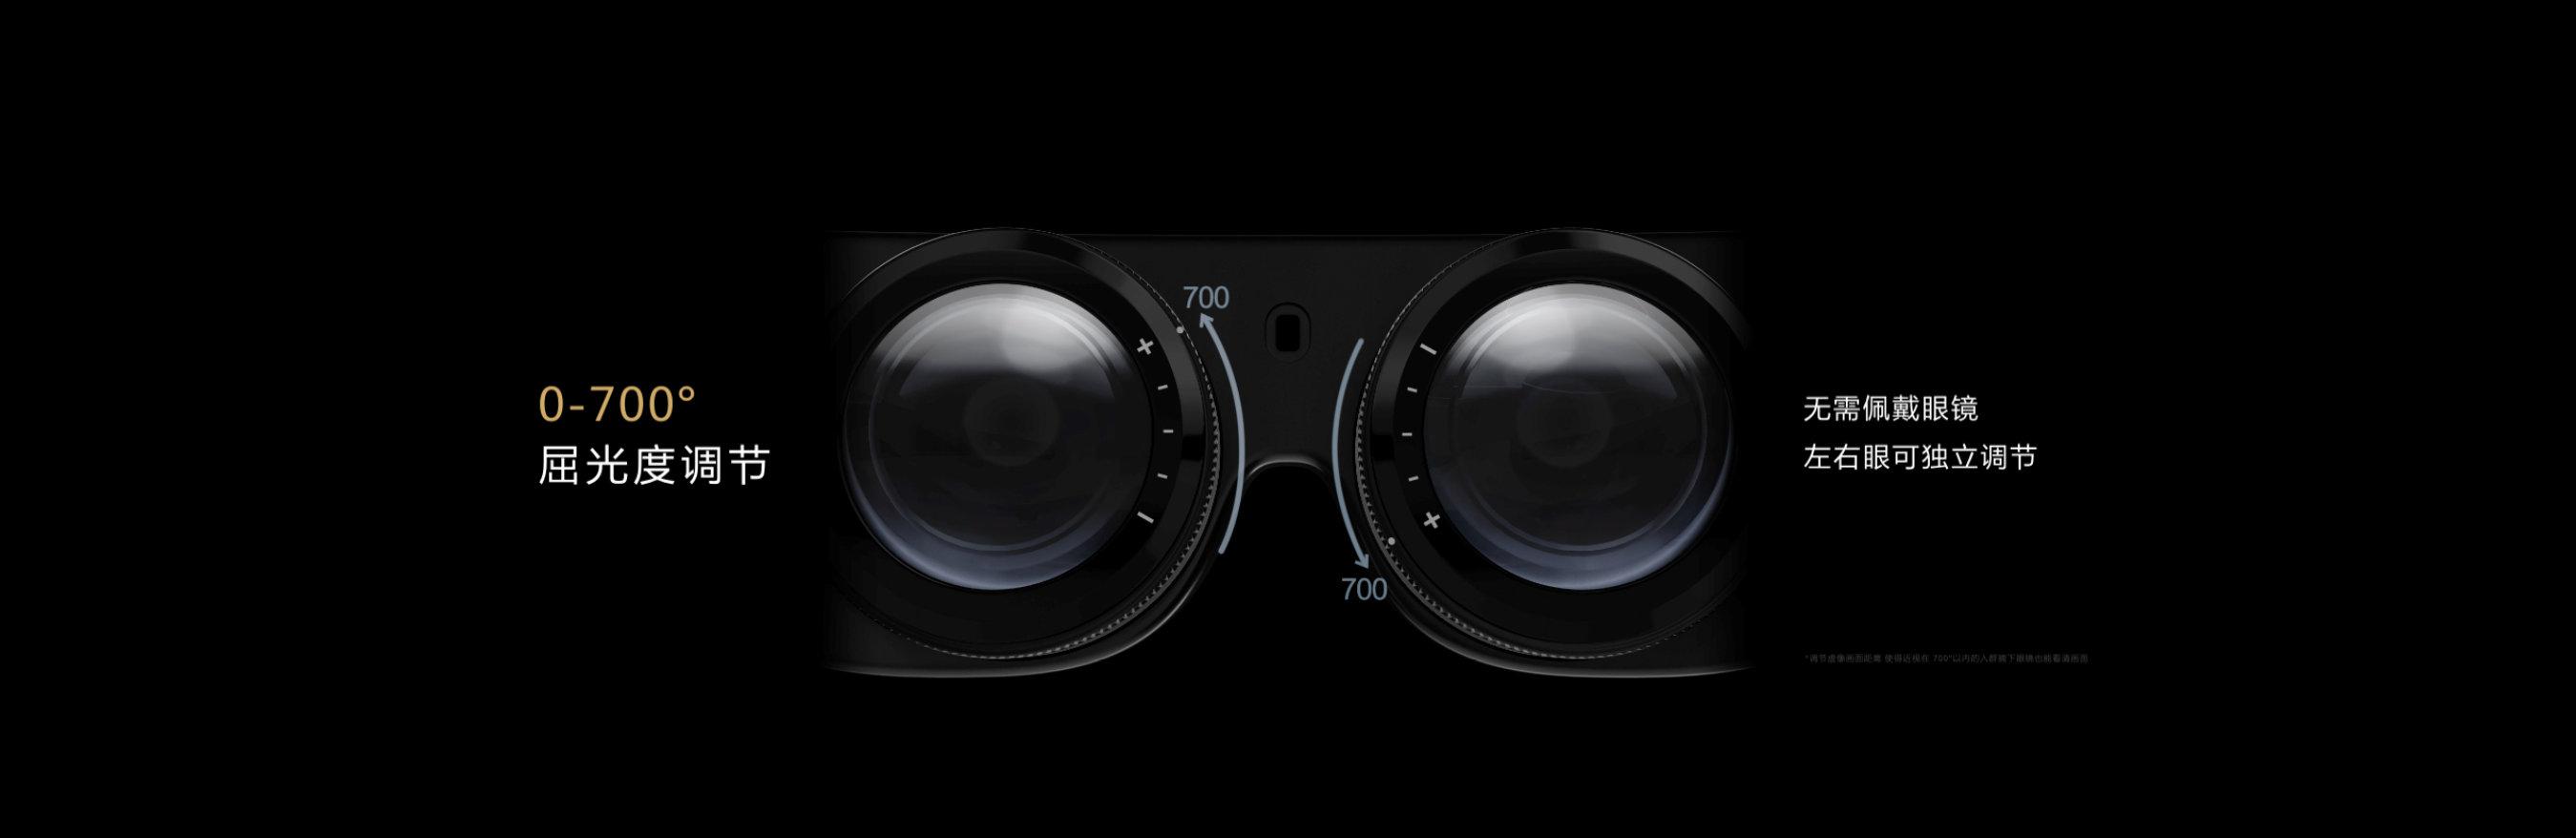 华为的one more thing:华为VR Glass亮相